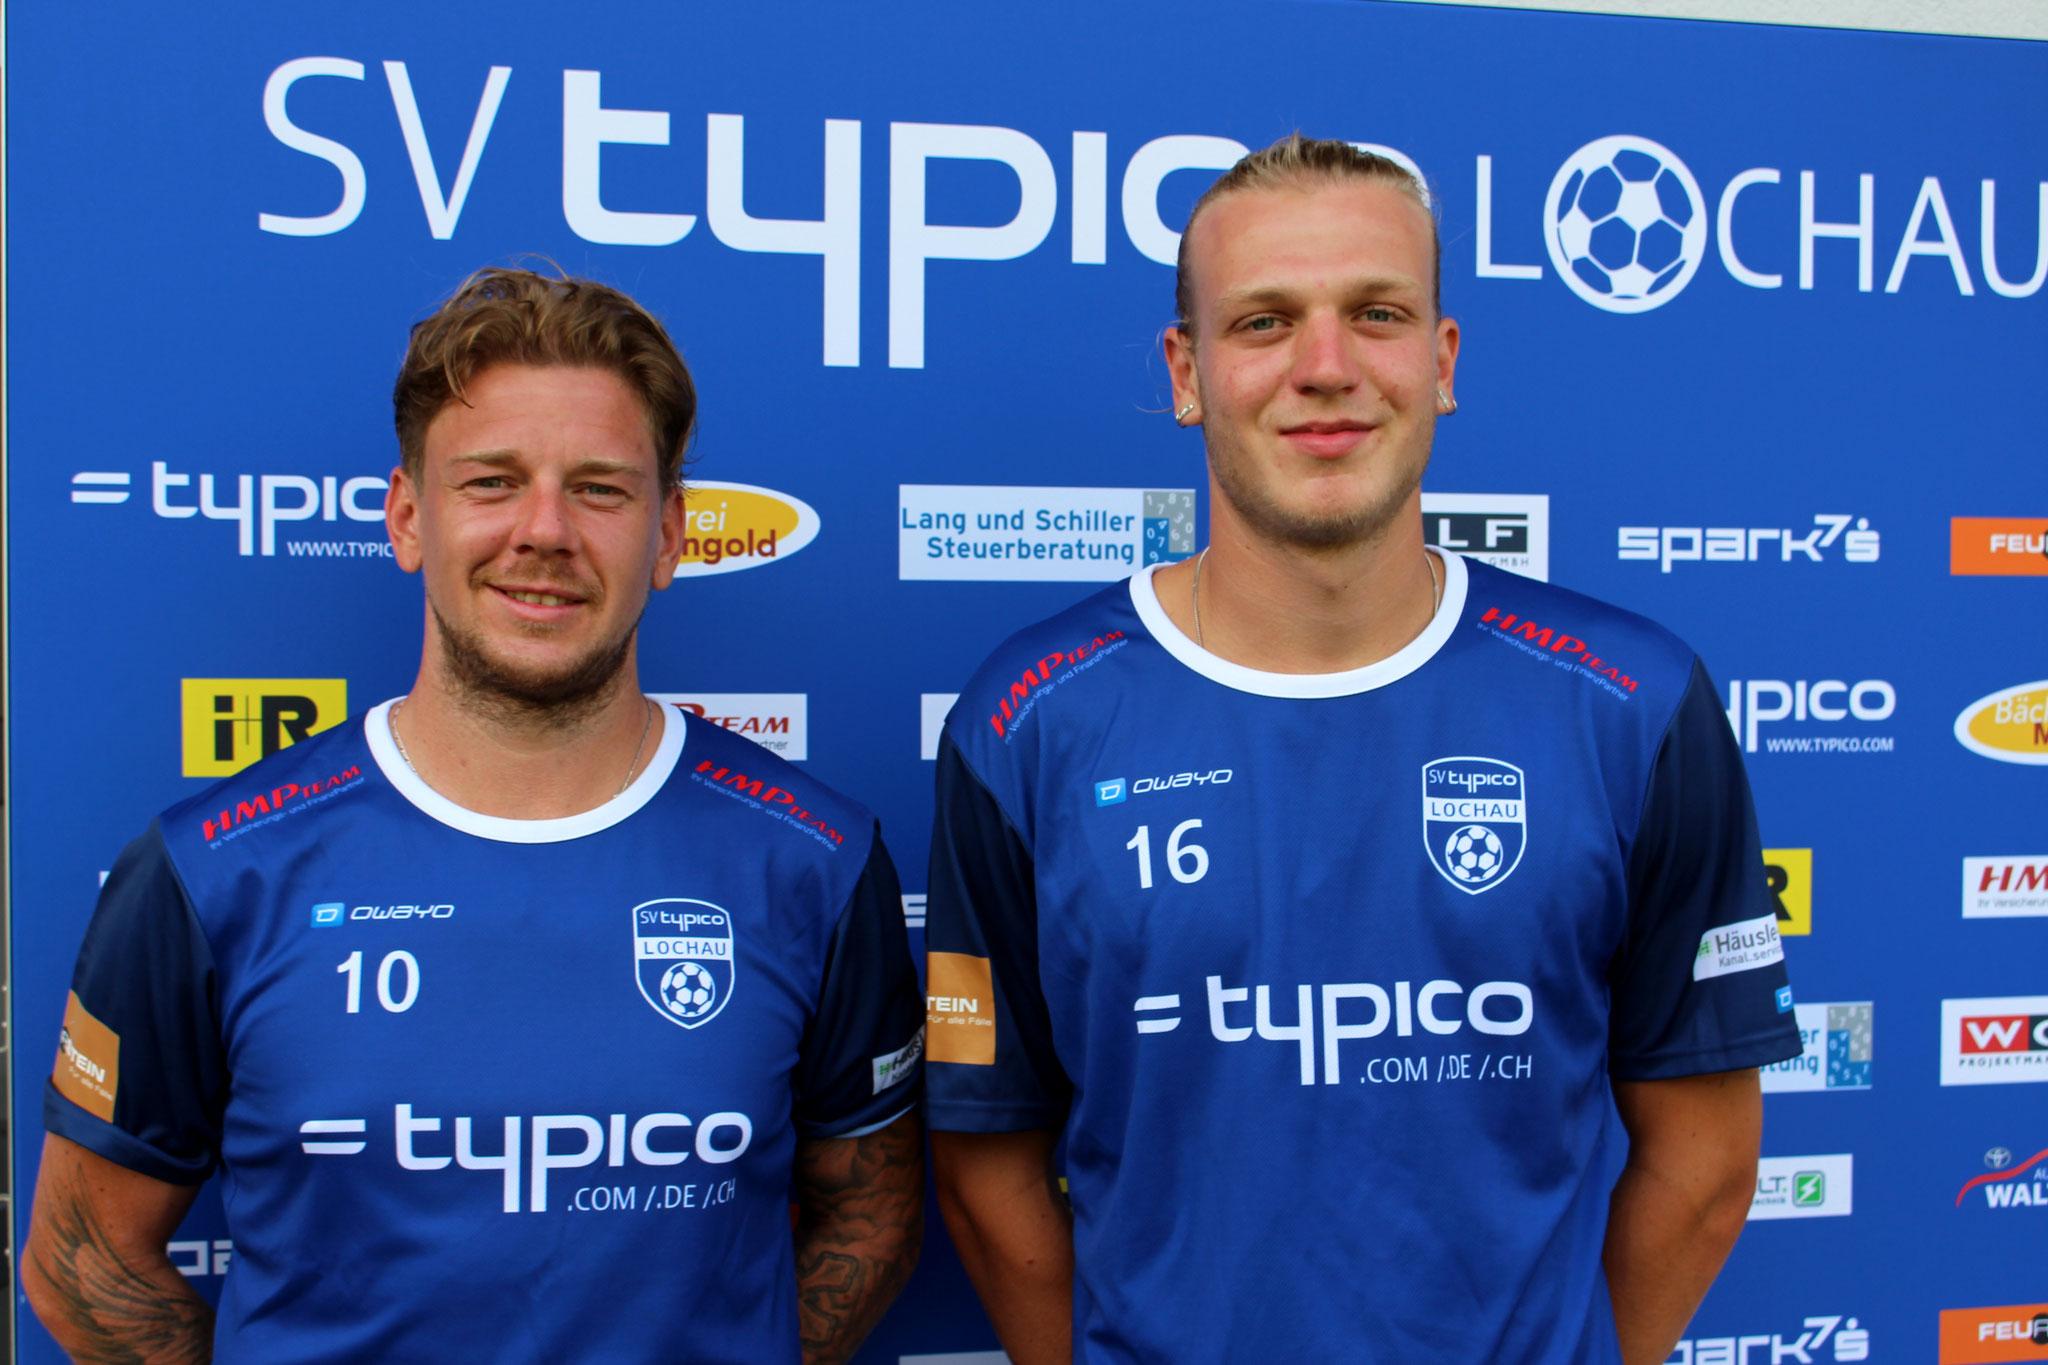 #10 Stefan Maccani & #16 Philipp Rupp